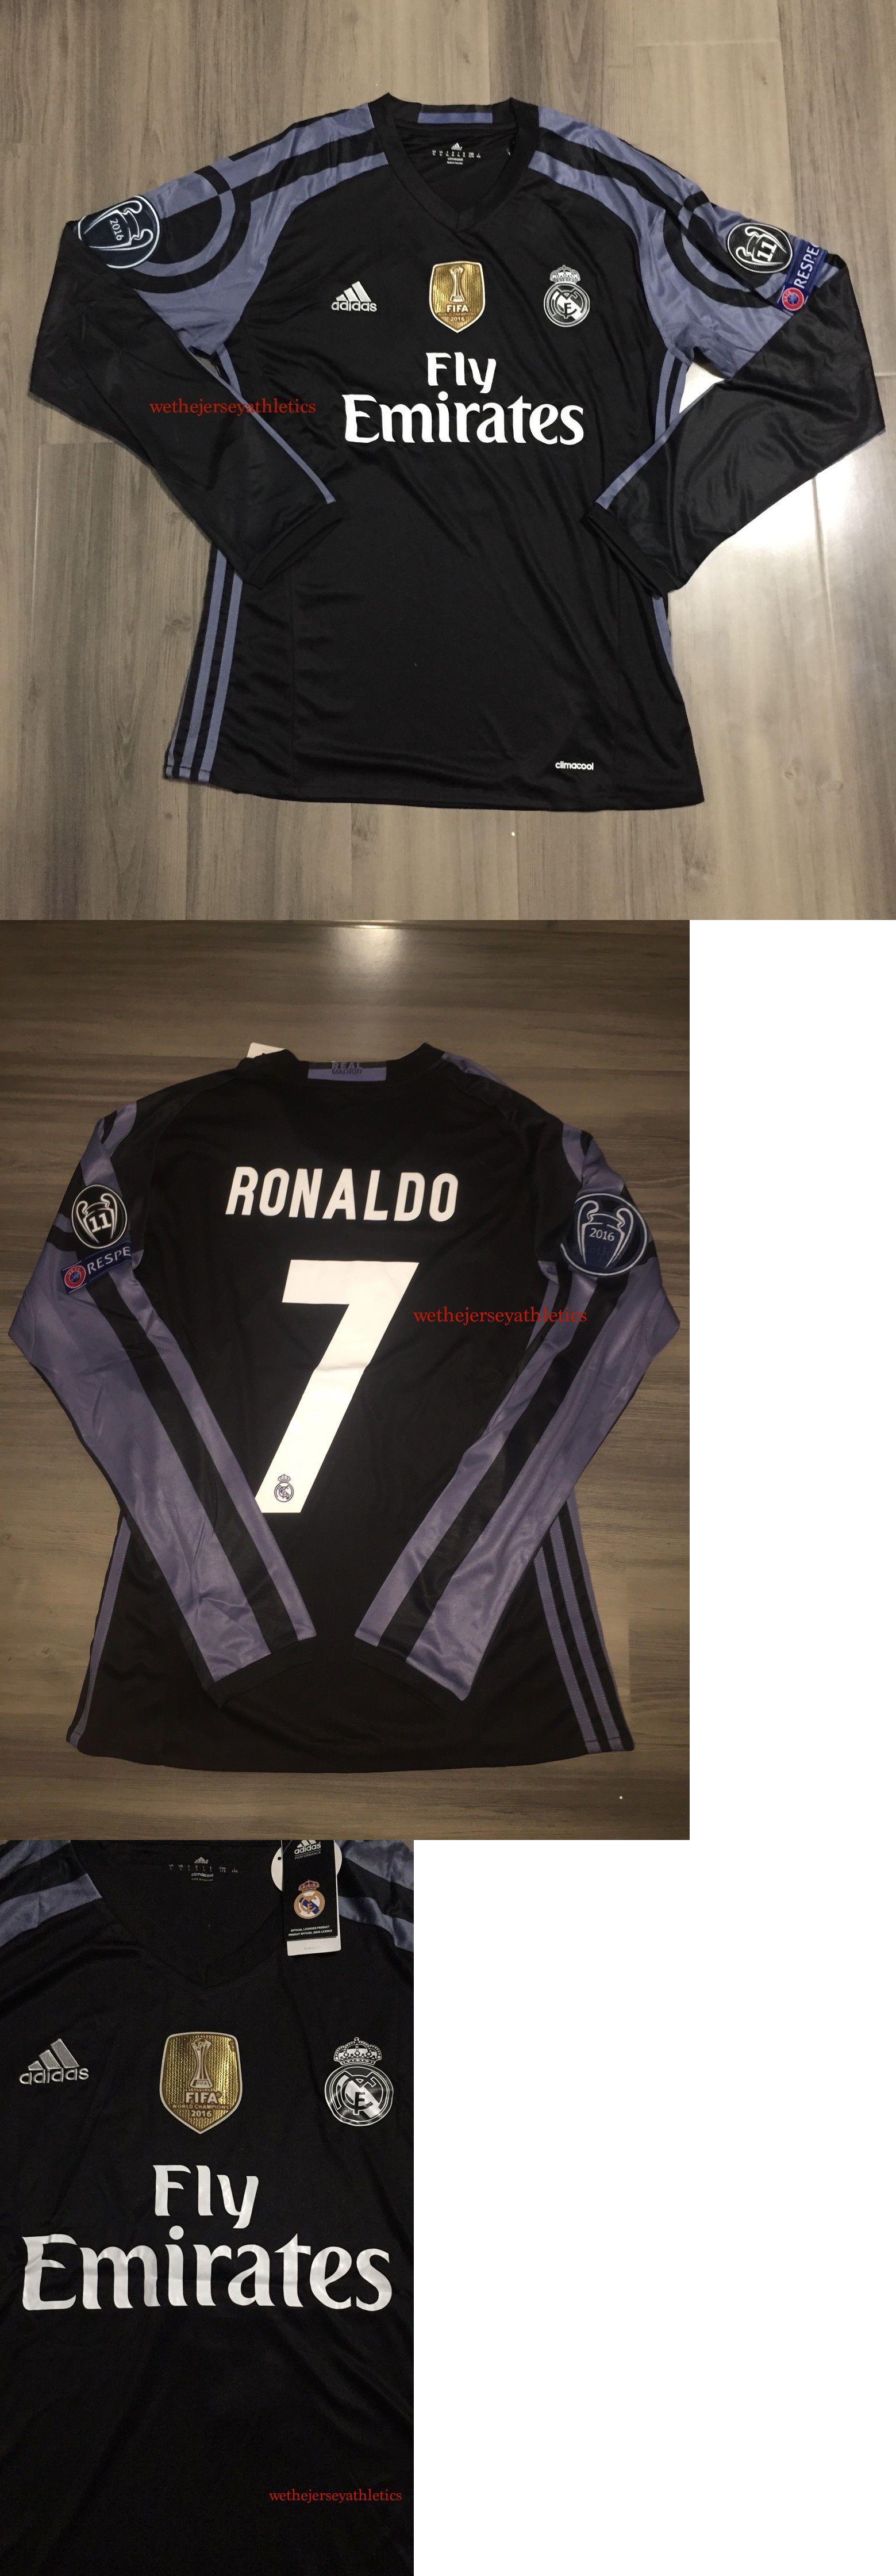 0f69614d0 ... Men 123490 Real Madrid Long Sleeve Cristiano Ronaldo Champions League Jersey  16 17 3Rd Kit Marcelo Real Madrid adidas 201617 Home FIFA ...